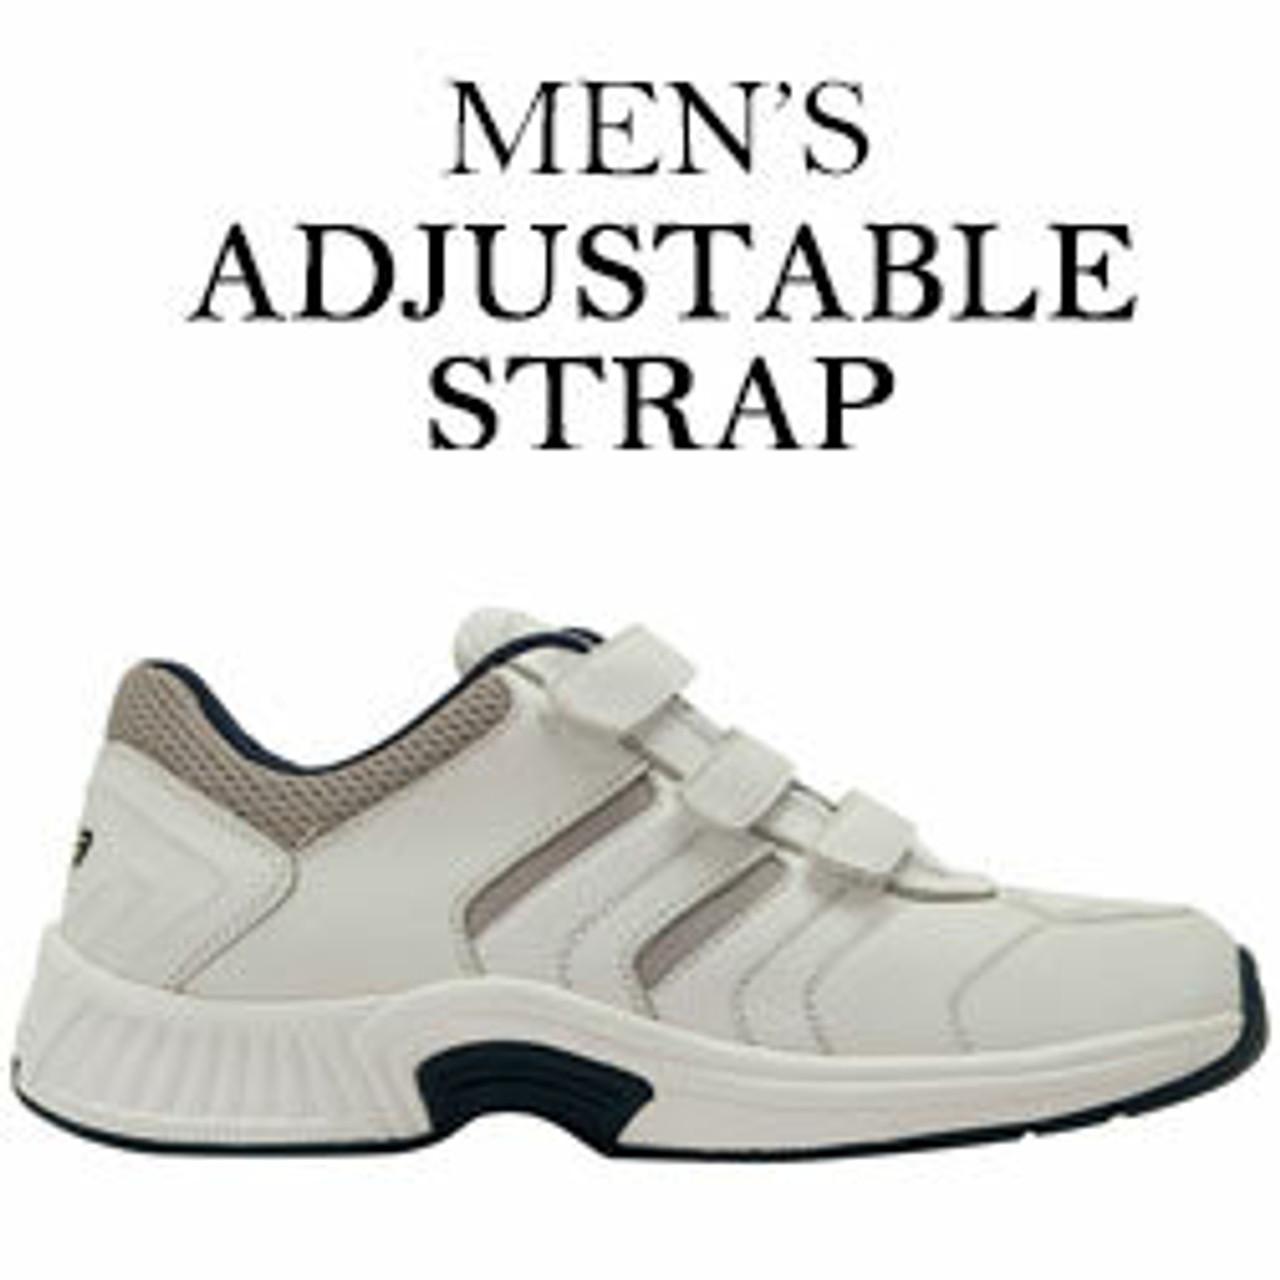 Men's Adjustable Strap Shoes